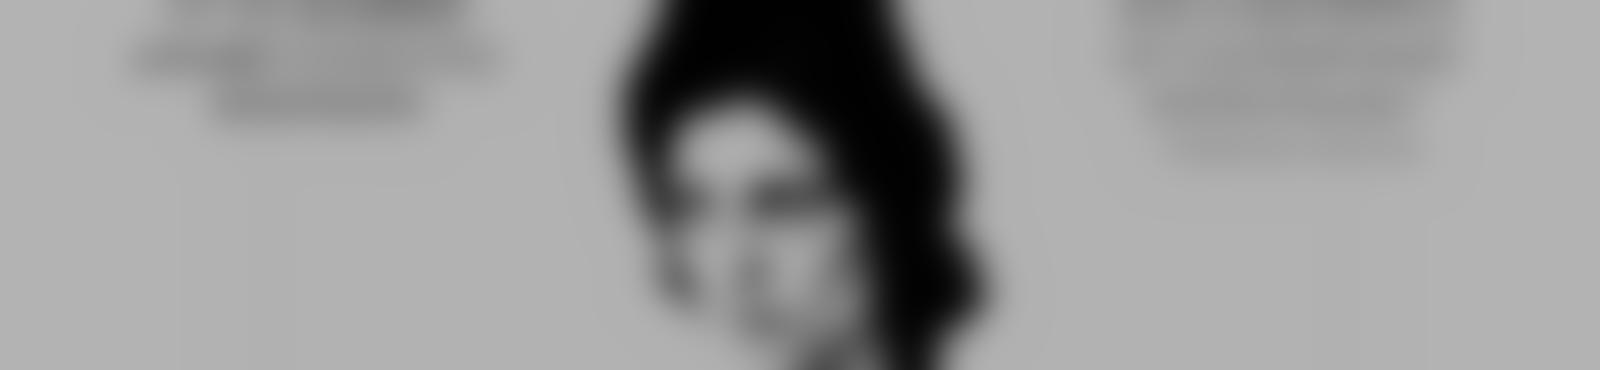 Blurred ea596479 ec33 4ab3 b0f3 ffe219c916e0